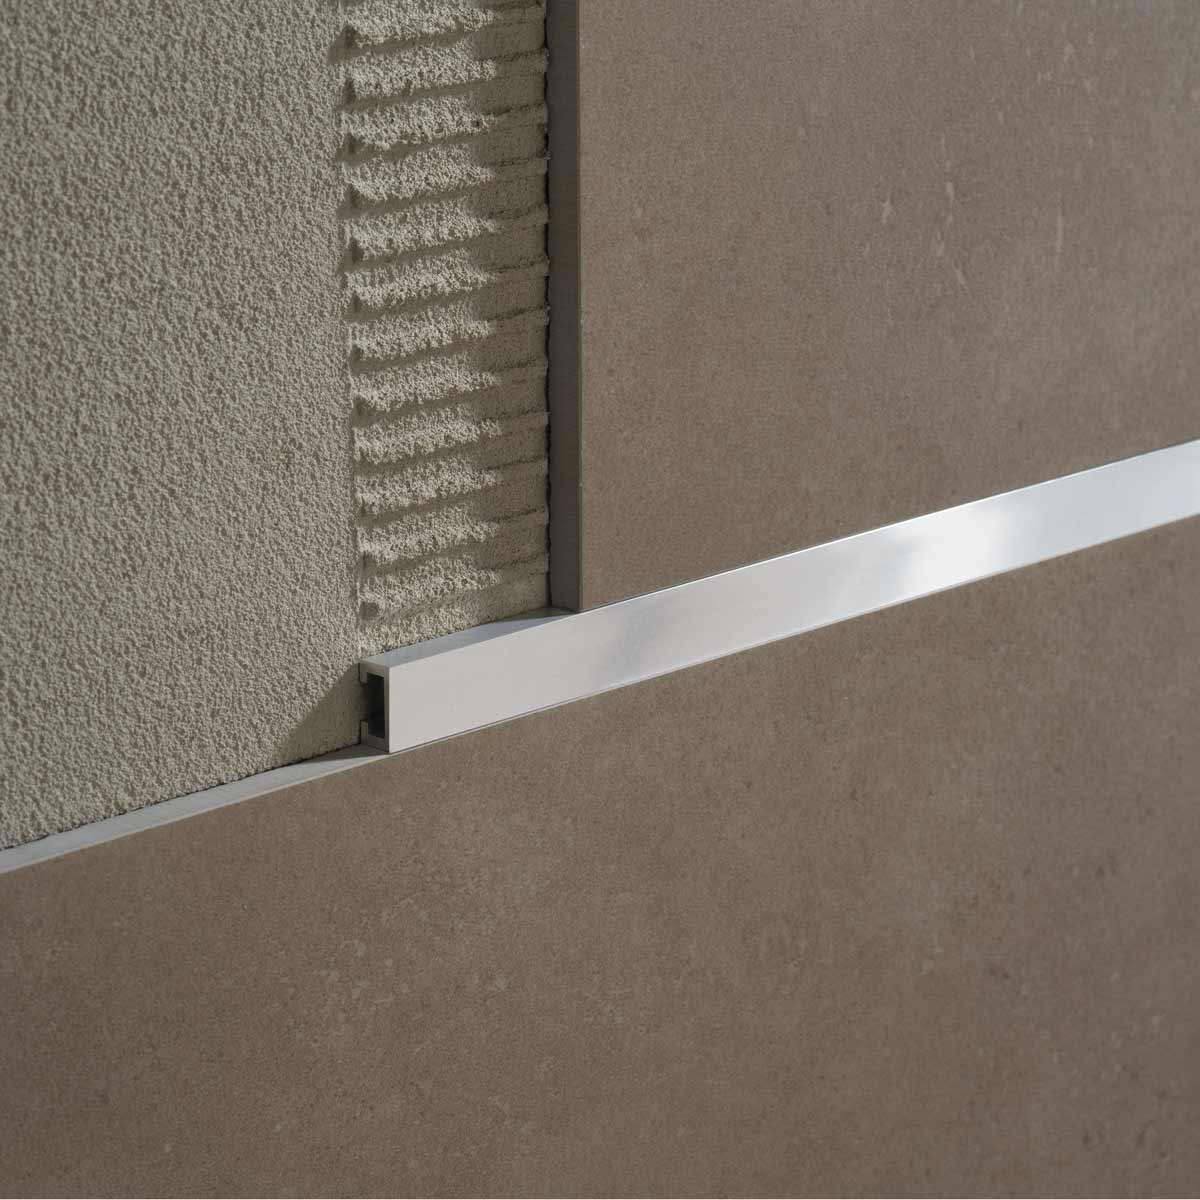 Profili per rivestimenti Profili decorativi per pareti Profilitec